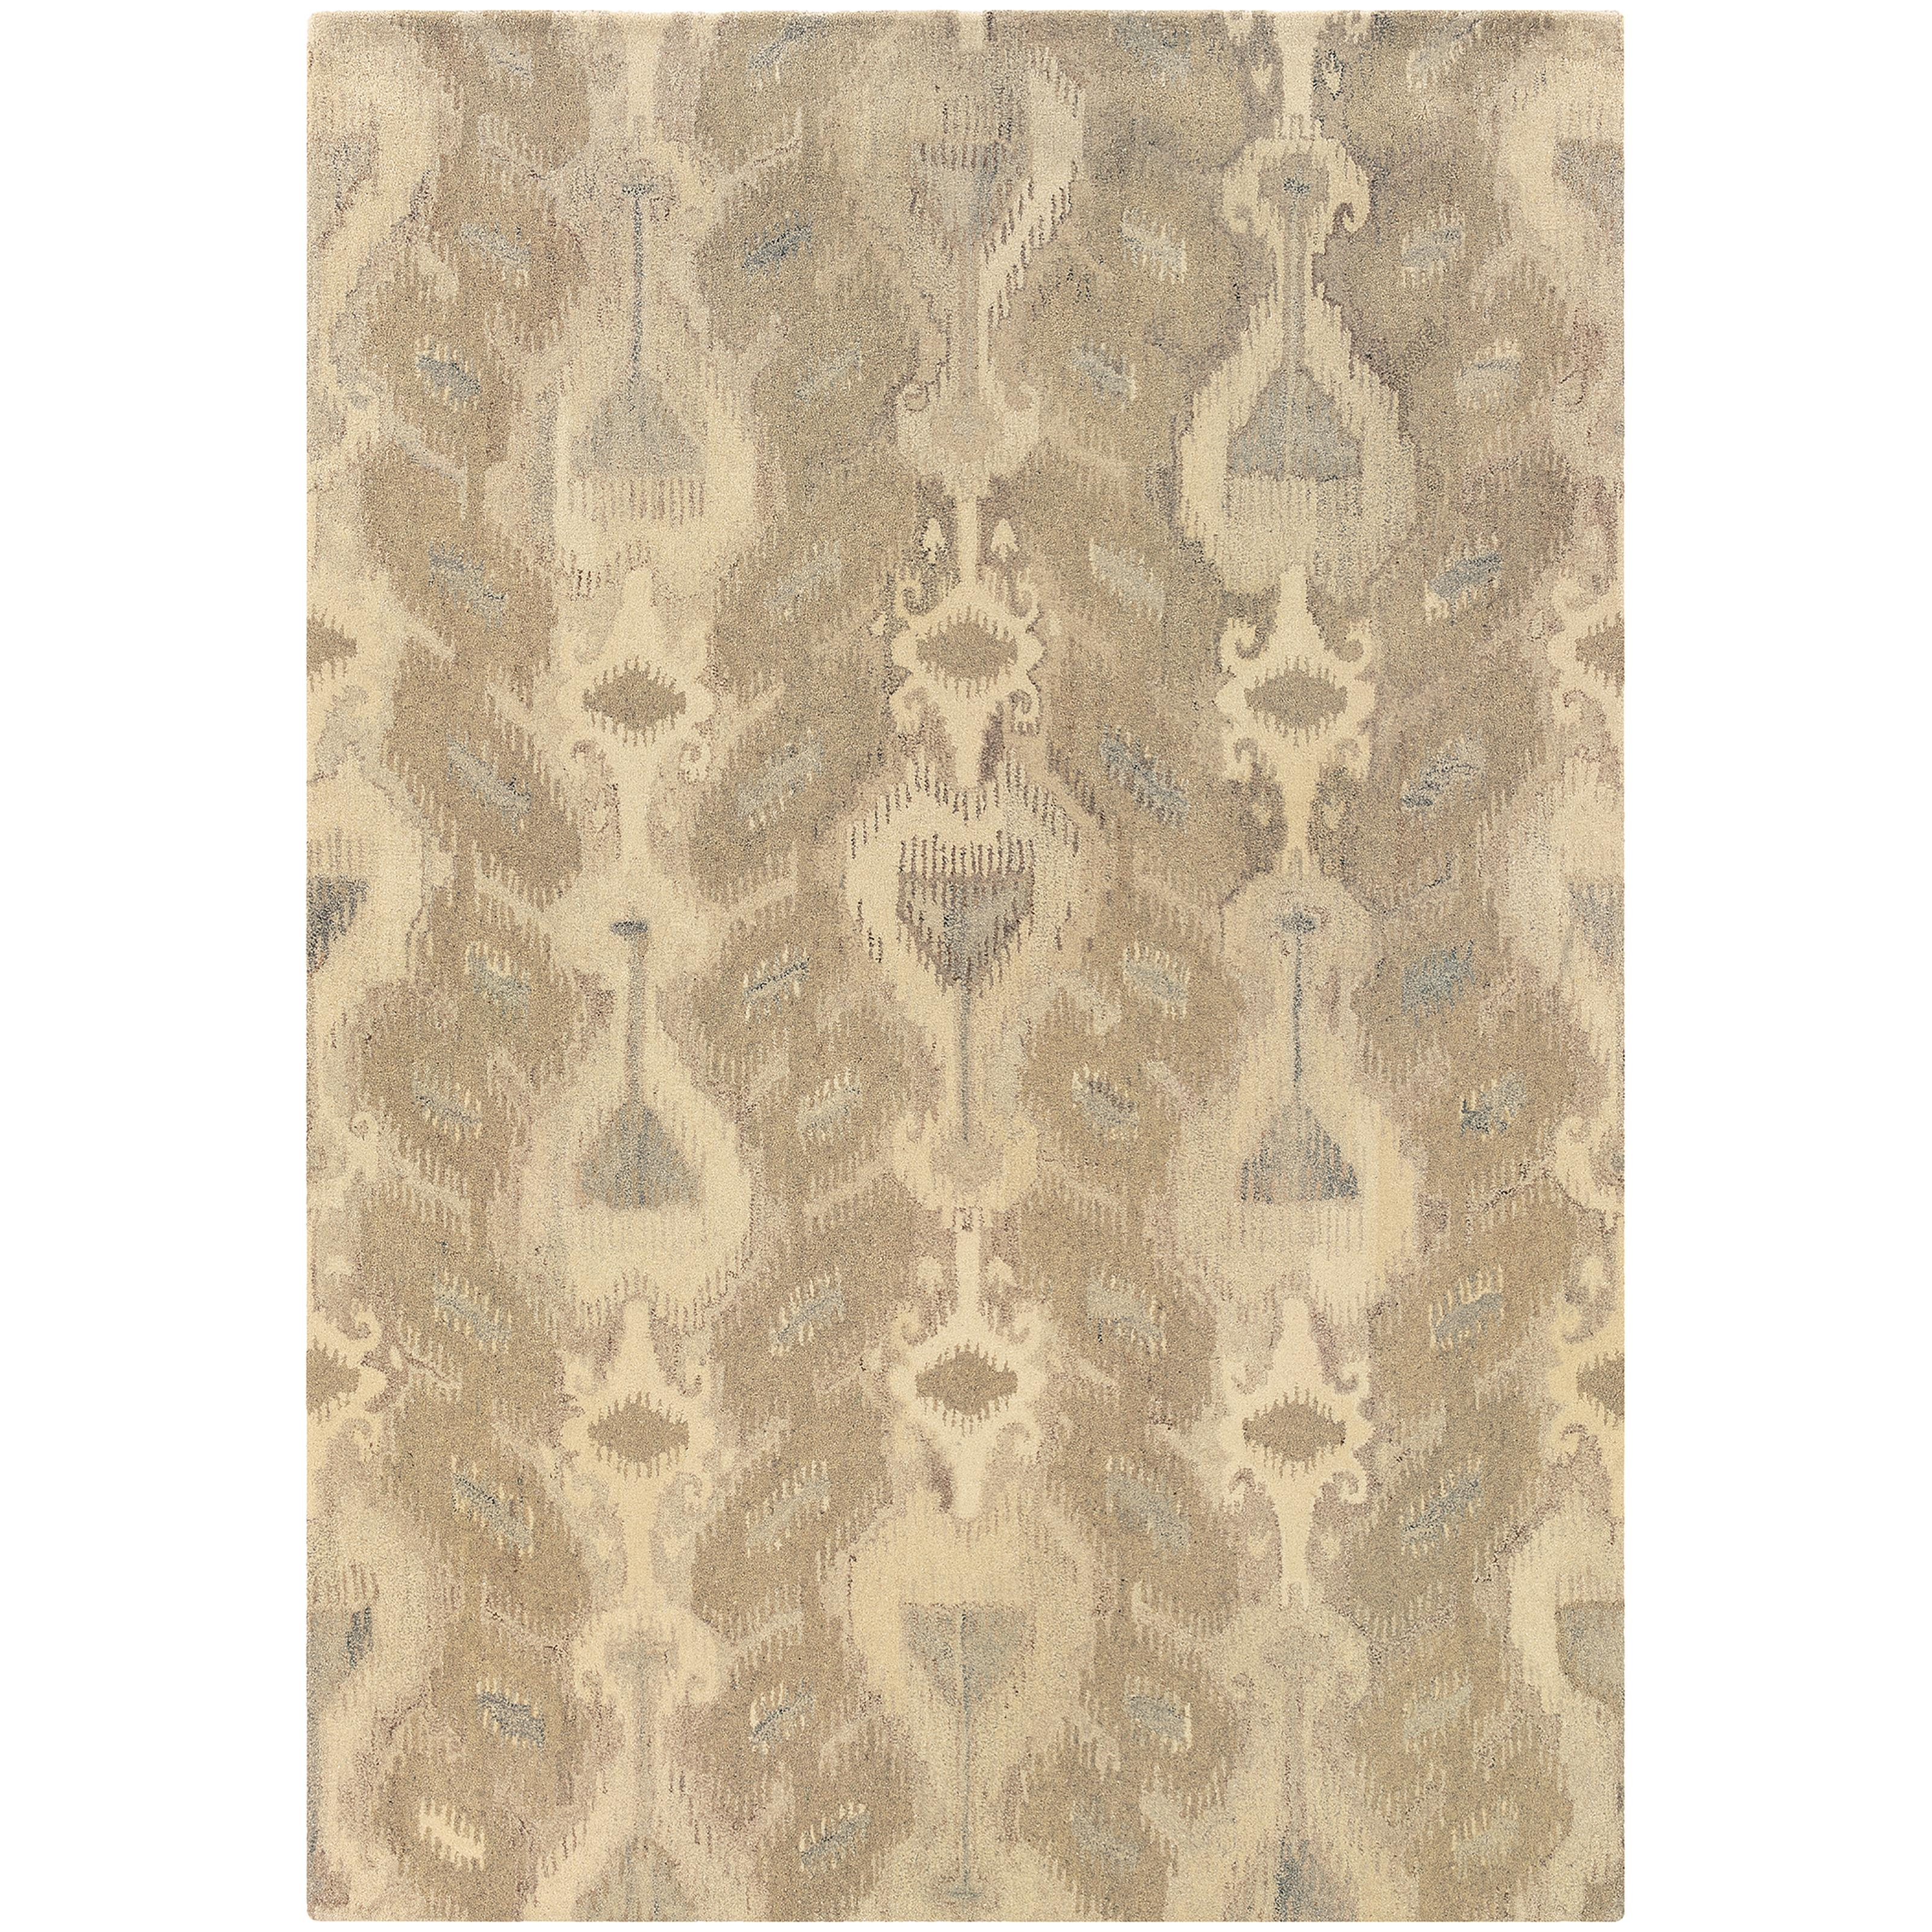 "Anastasia 3' 6"" X  5' 6"" Rug by Oriental Weavers at Novello Home Furnishings"